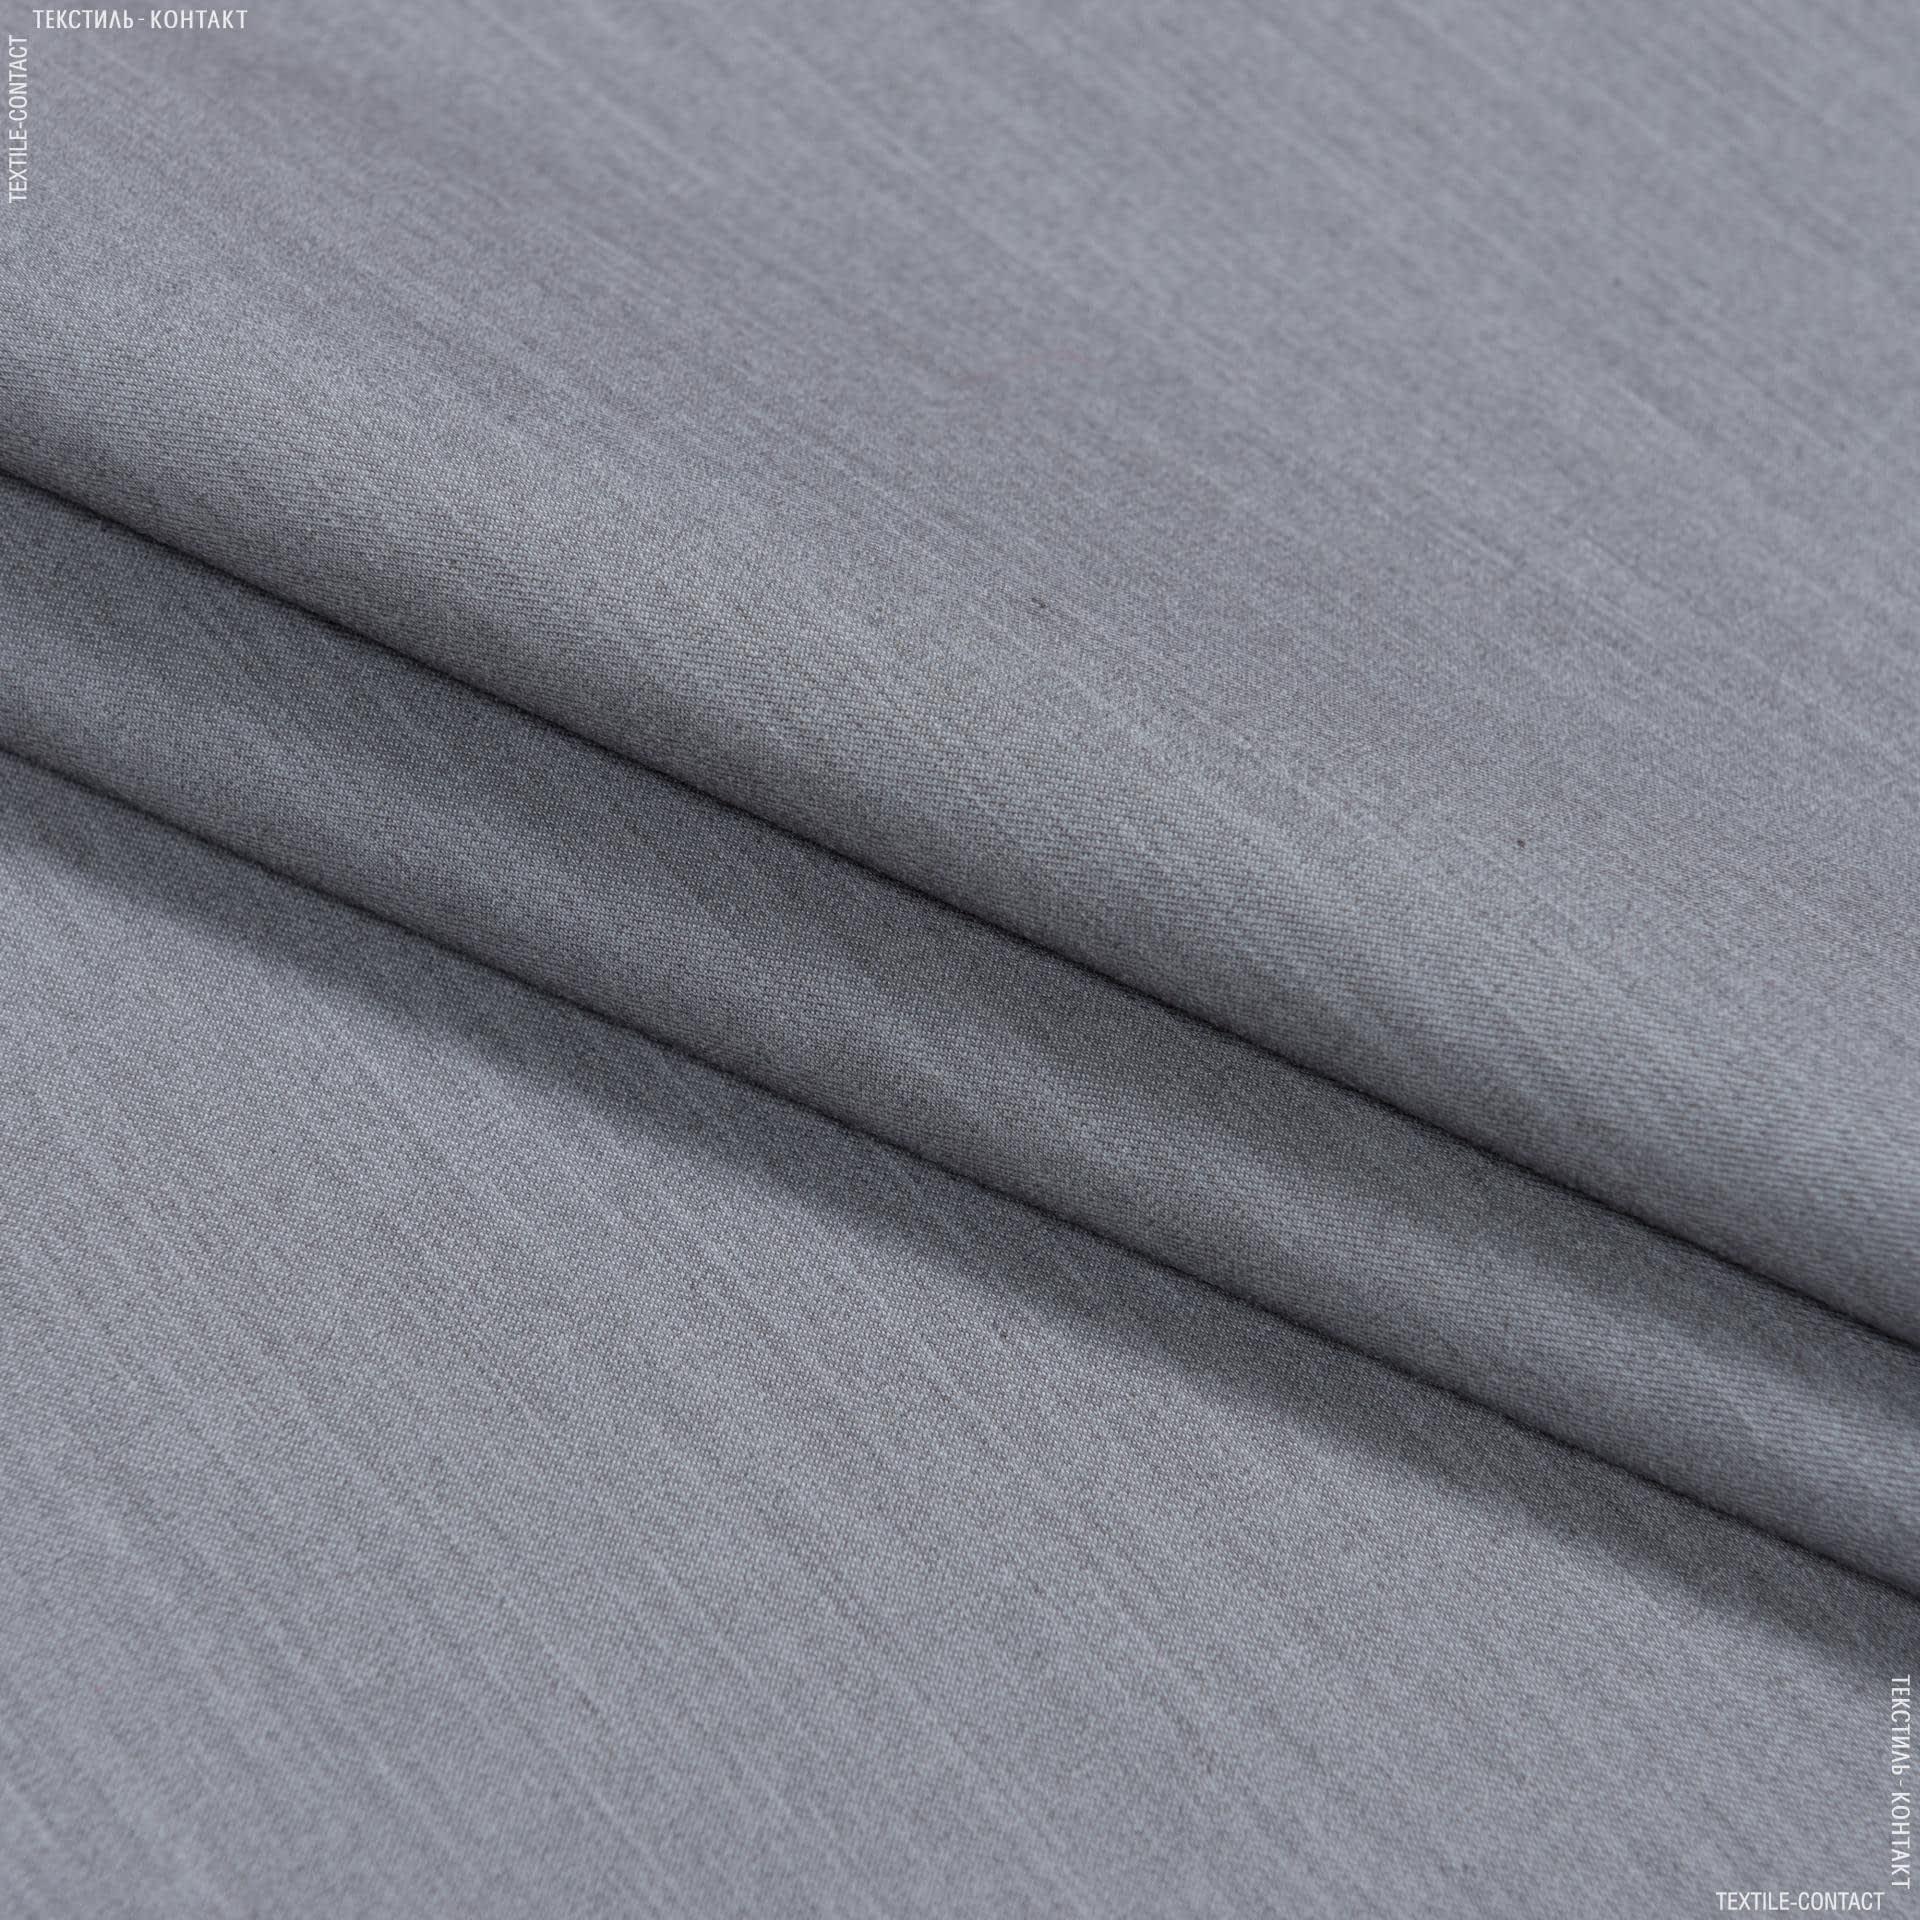 Ткани для брюк - Костюмная тесла-1 меланж серый